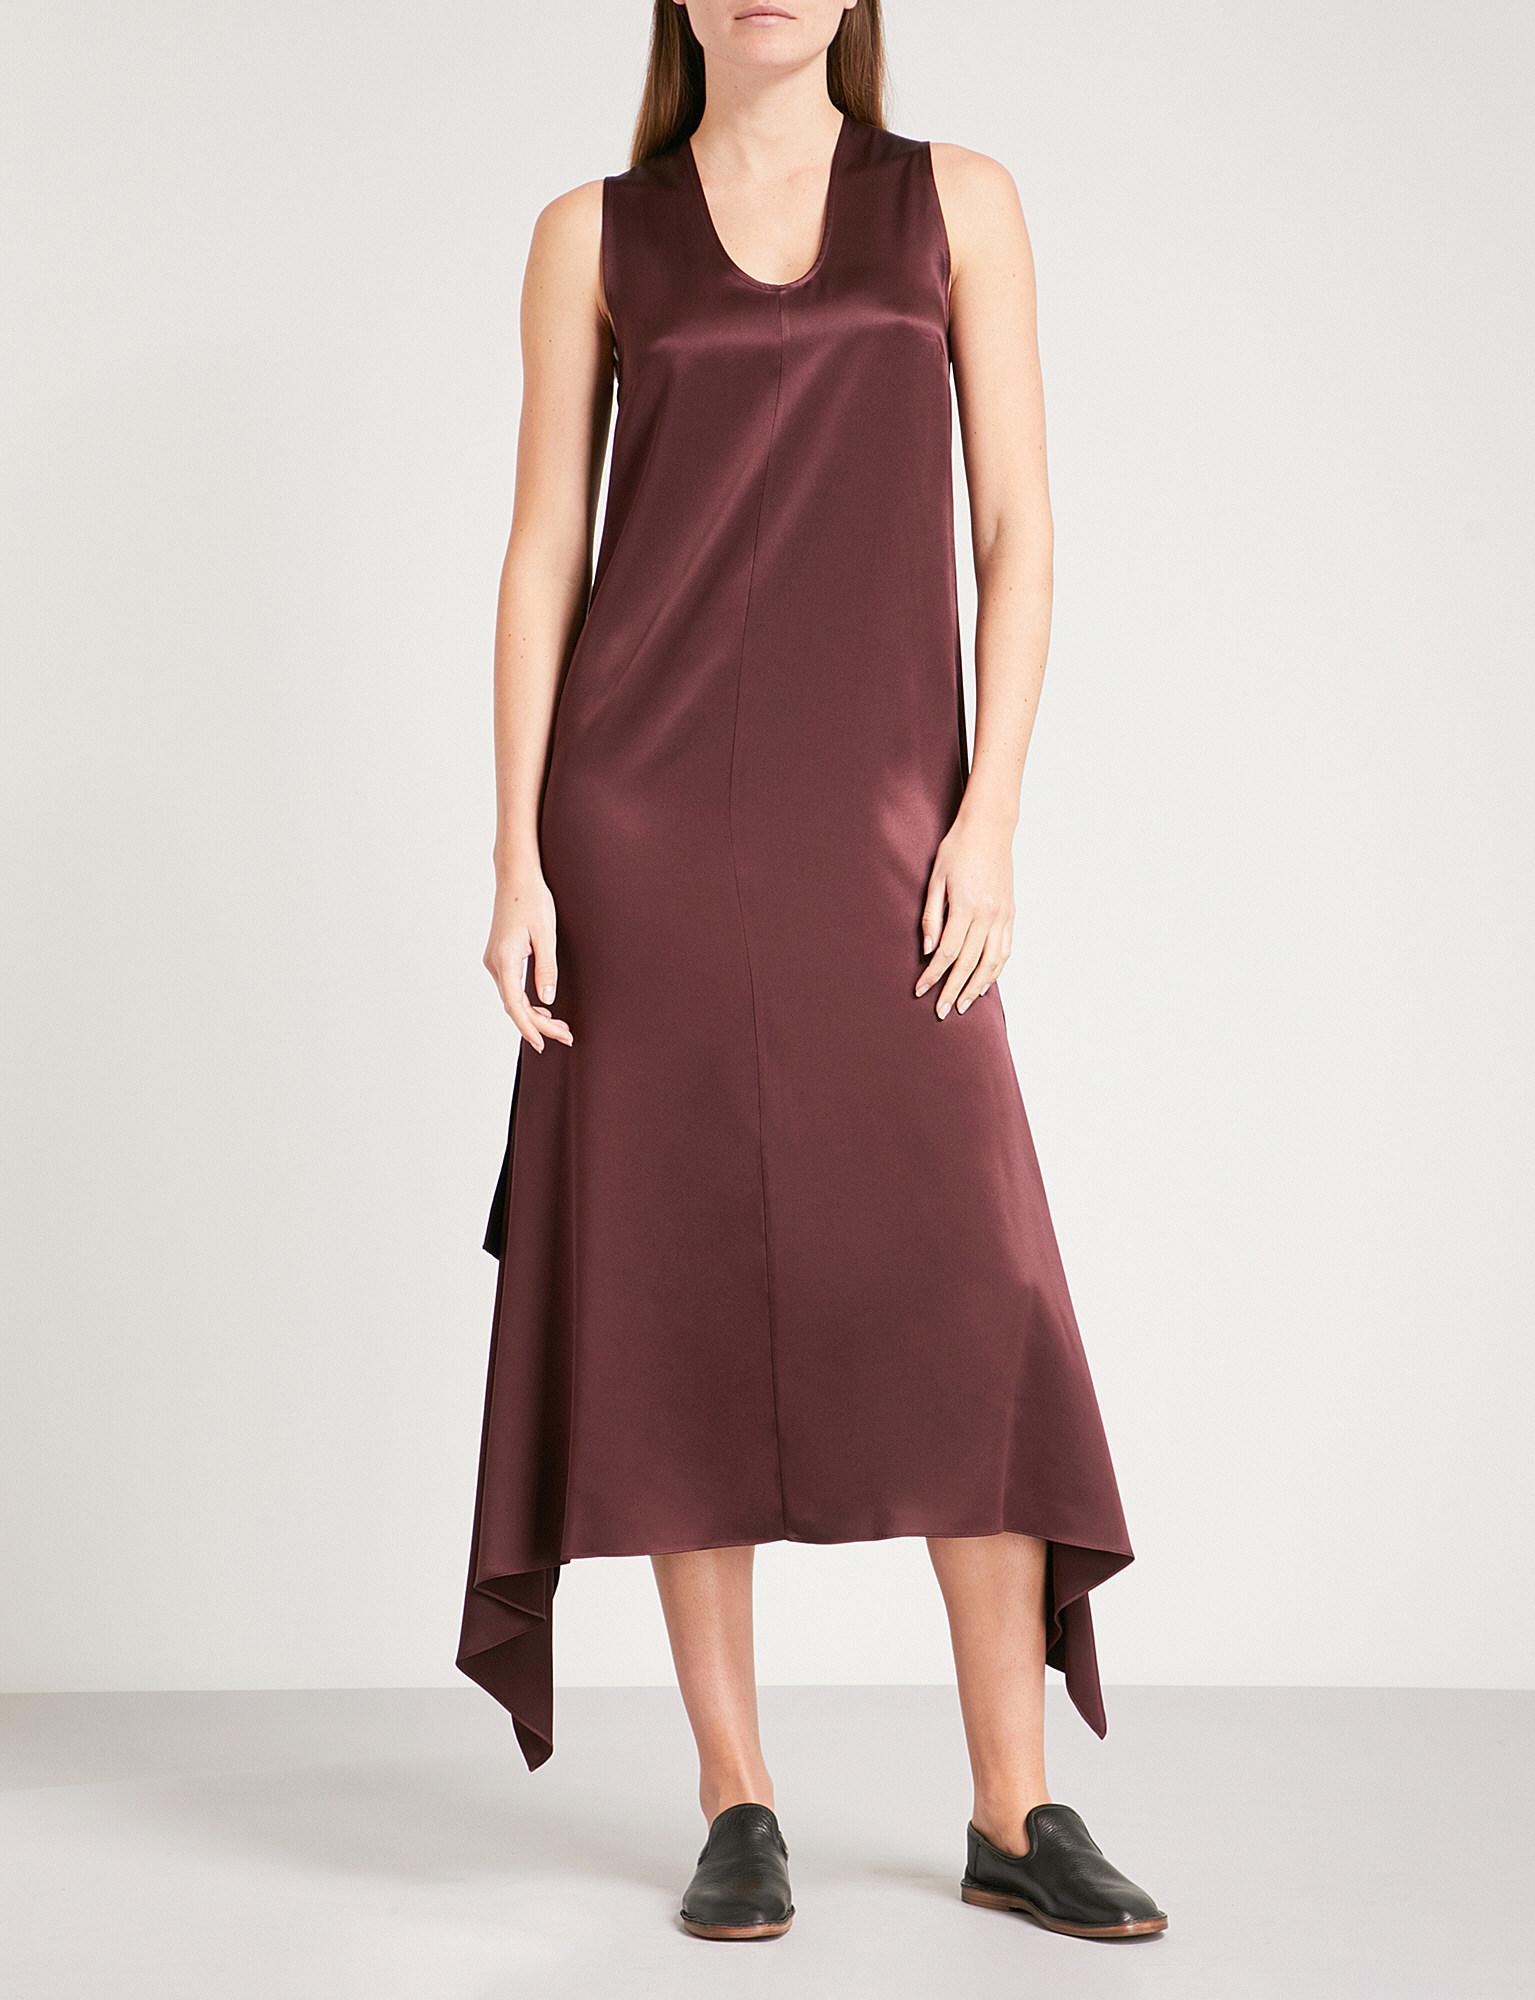 2dea0b0bbca2 JOSEPH Woman Draped Silk-satin Midi Dress Merlot - Lyst